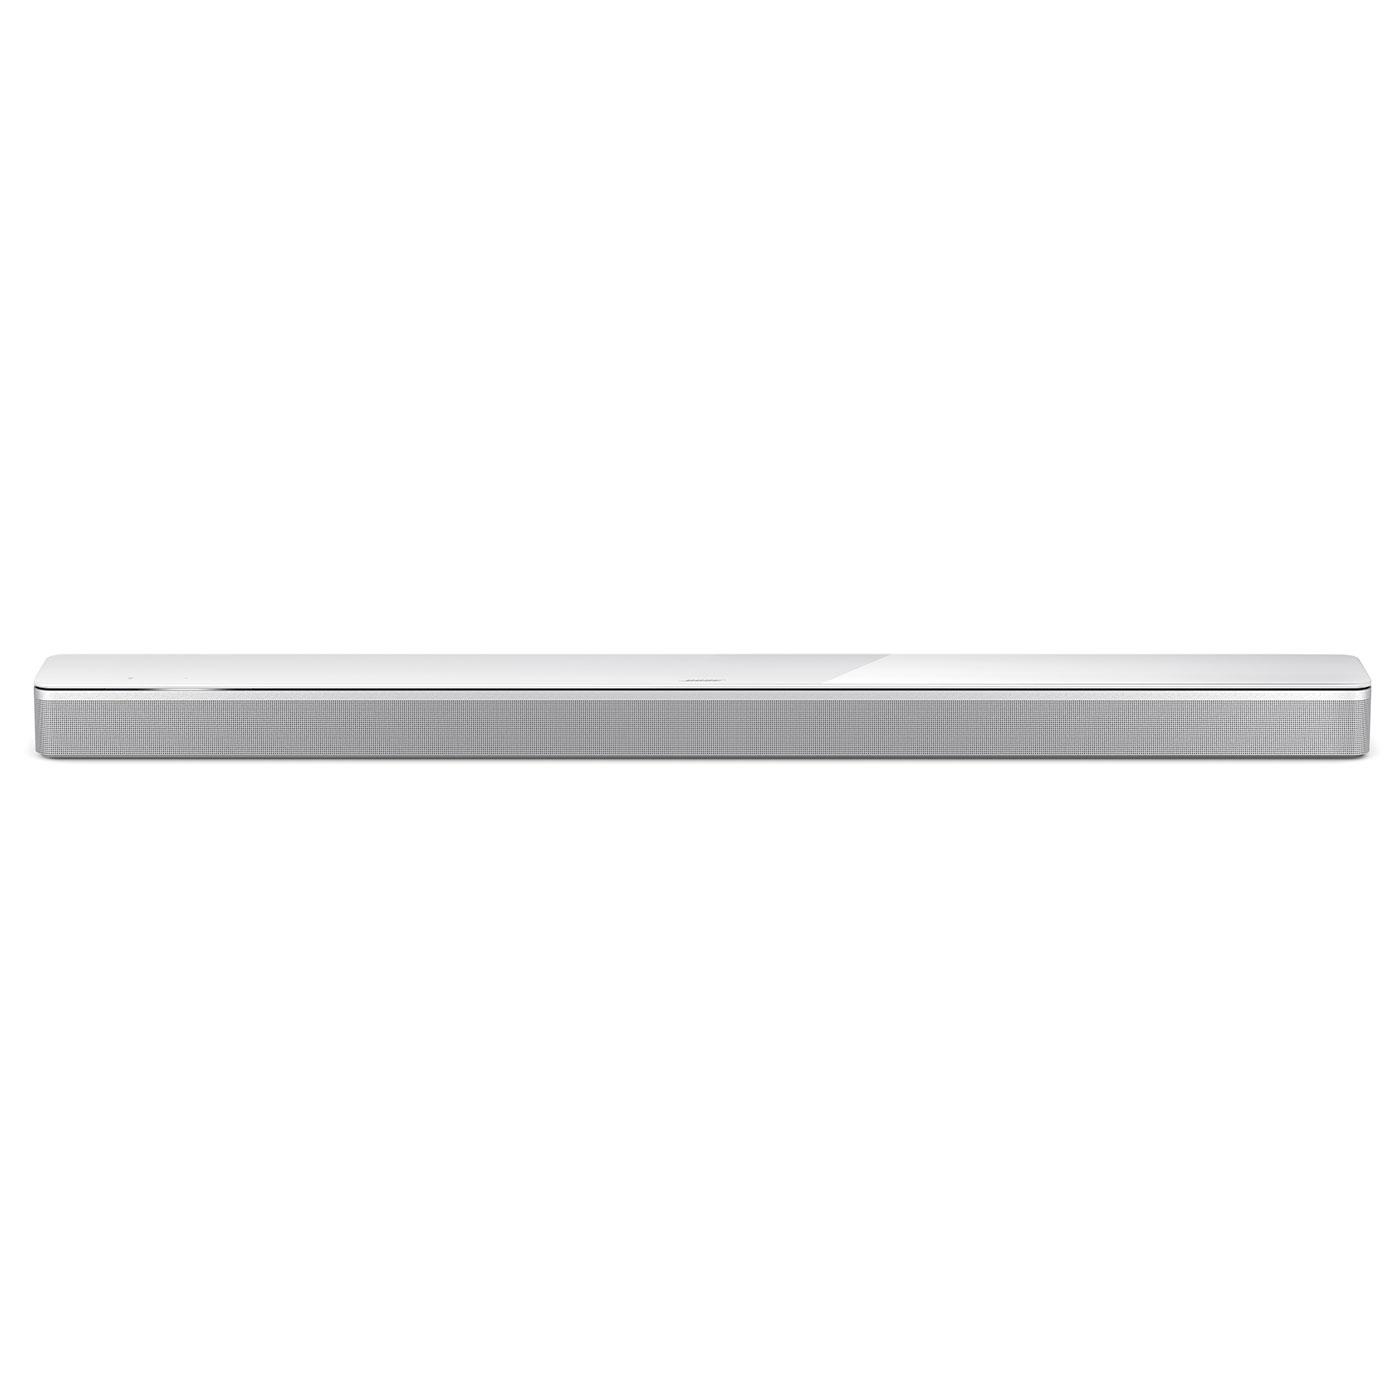 Barre de son Bose Soundbar 700 Arctique Barre de son multiroom - Bluetooth - Wi-Fi - Amazon Alexa - Spotify/Deezer - Autocalibration - Télécommande universelle